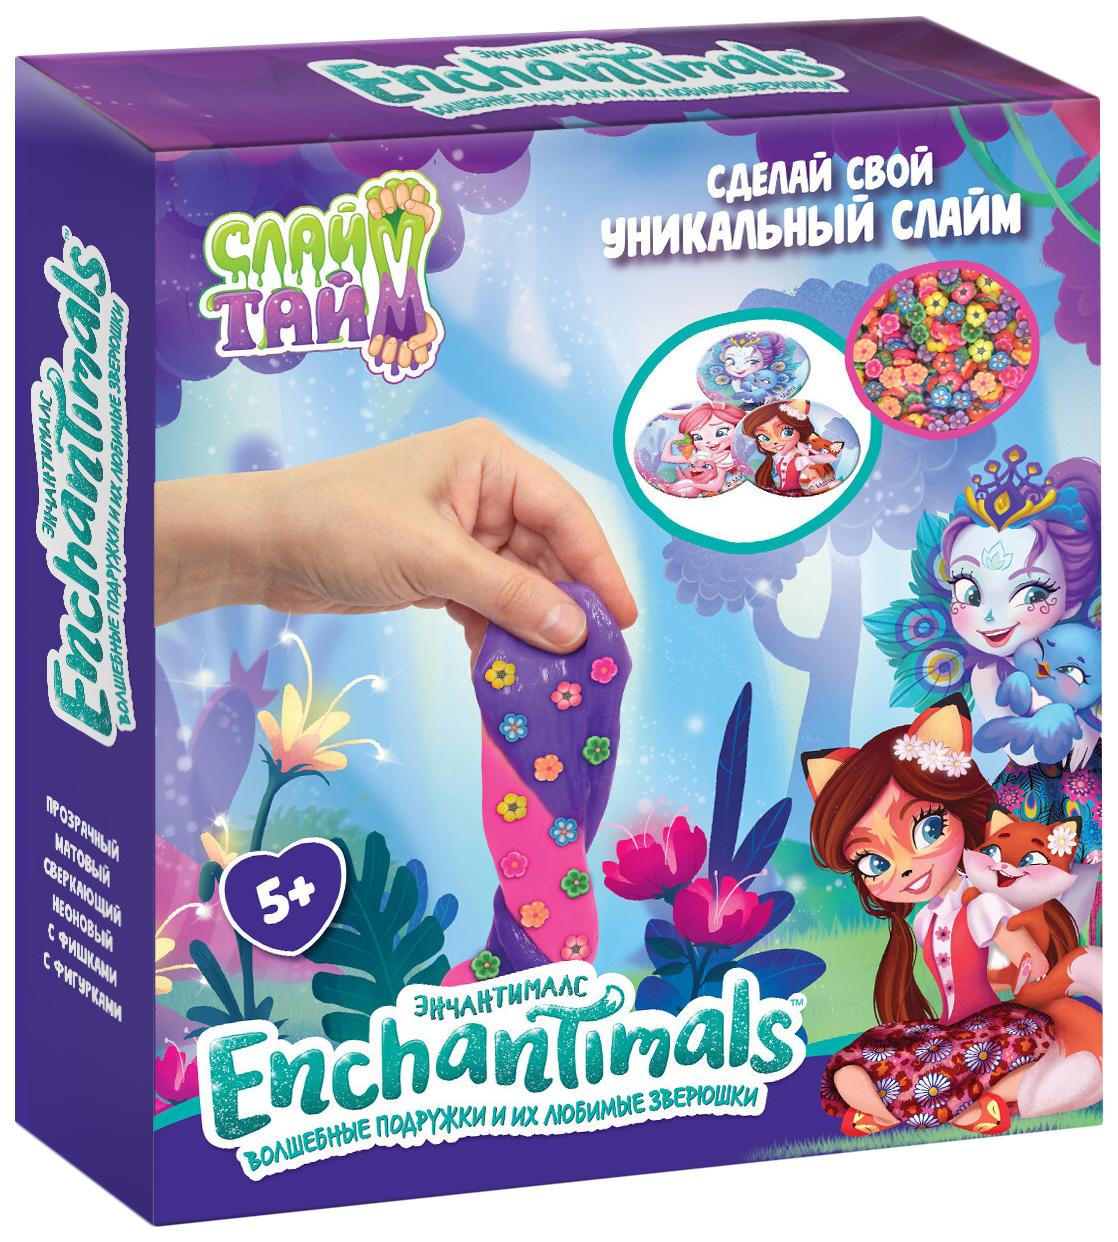 Набор 1 TOY Слайм тайм Enchantimals Т16617